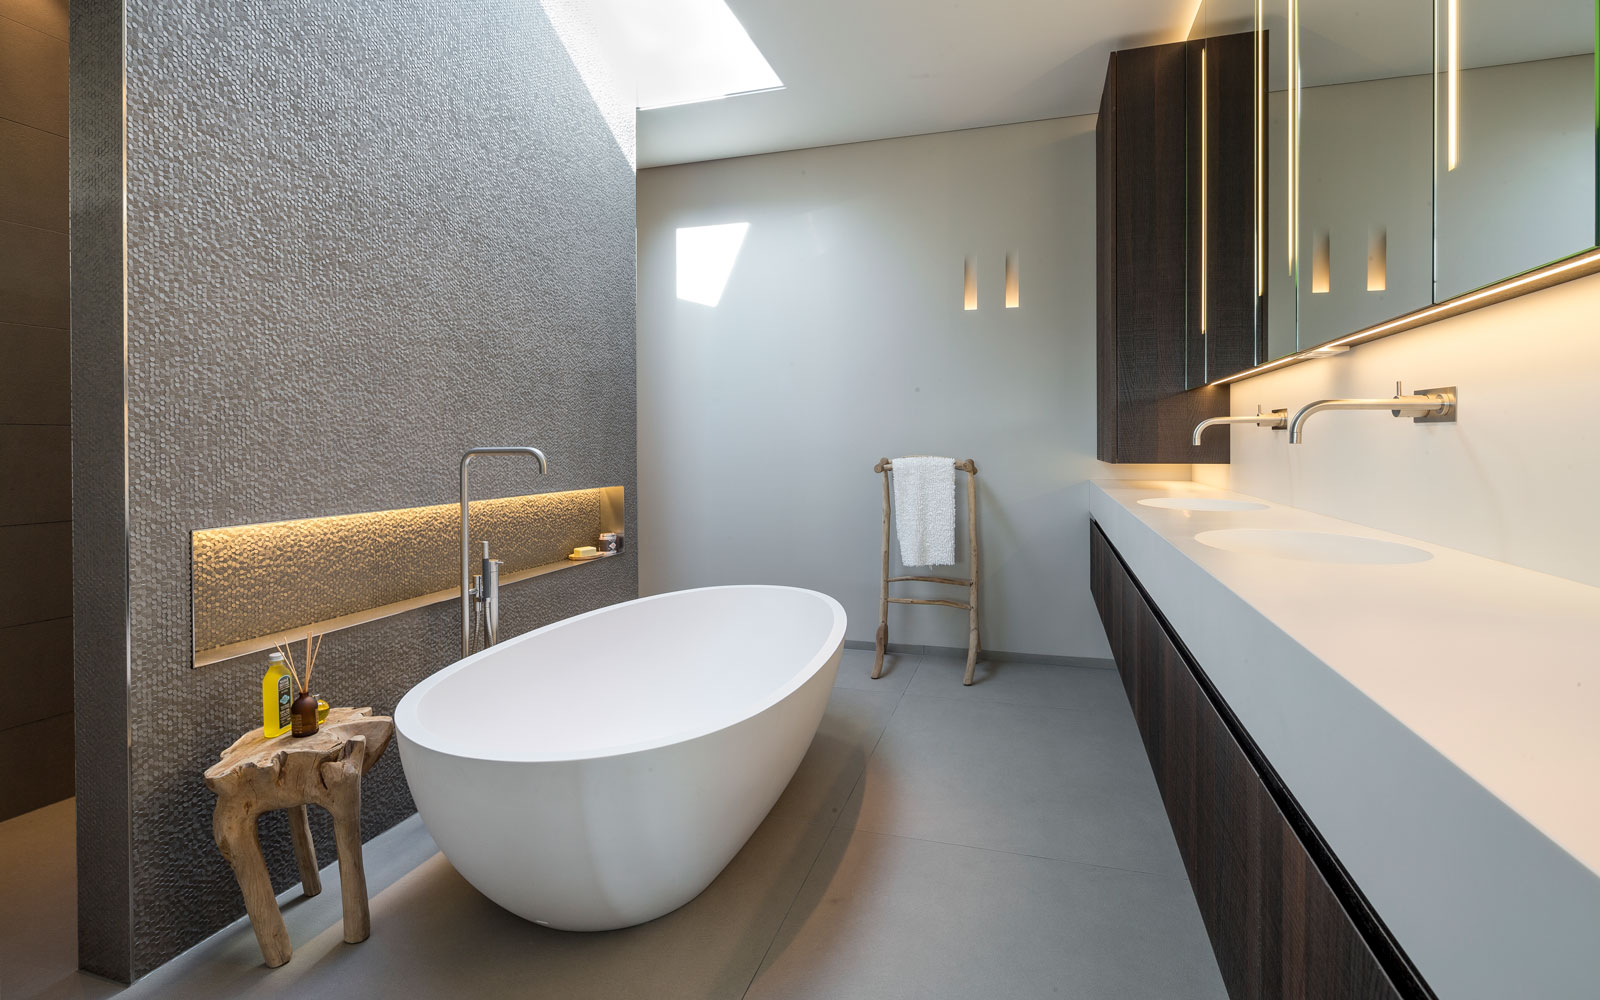 Badkamer, sanitair, vrijstaand bad, Agape, wastafel, kraan, VOLA, moderne villa, François Hannes